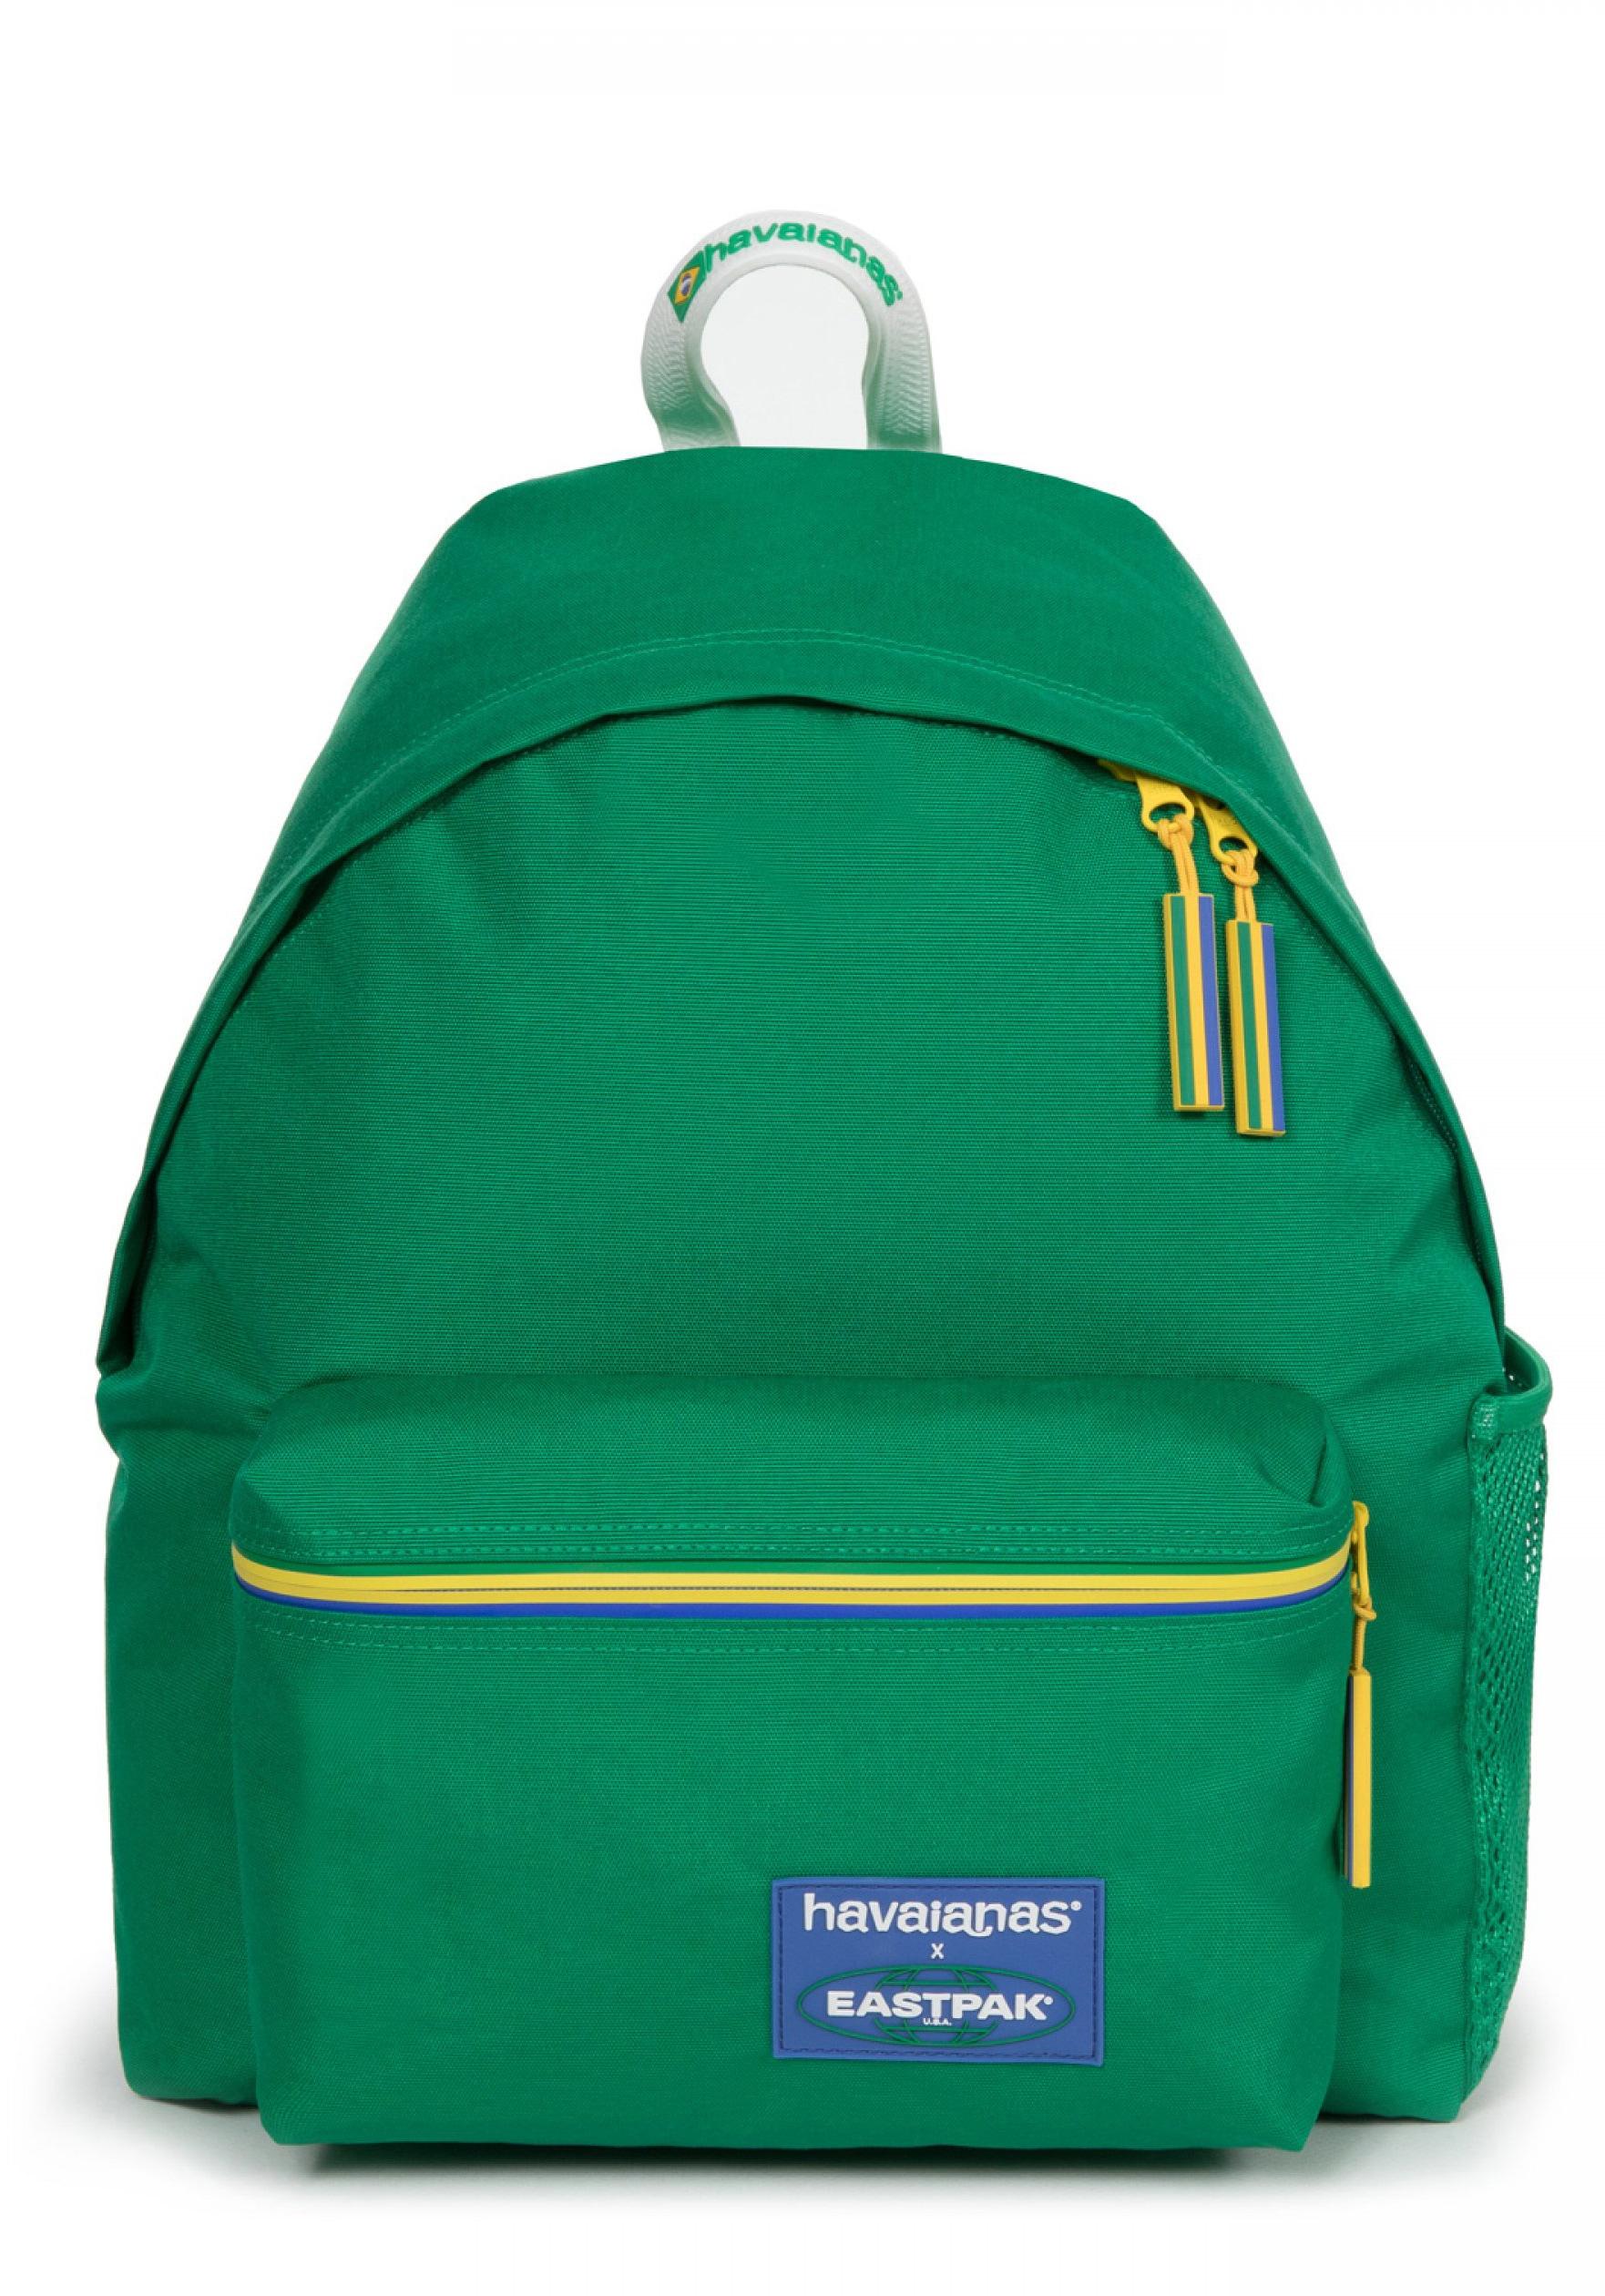 Eastpak Freizeitrucksack Eastpak x Havaianas - PADDED PAK'R havaianas green, grün, Kinder